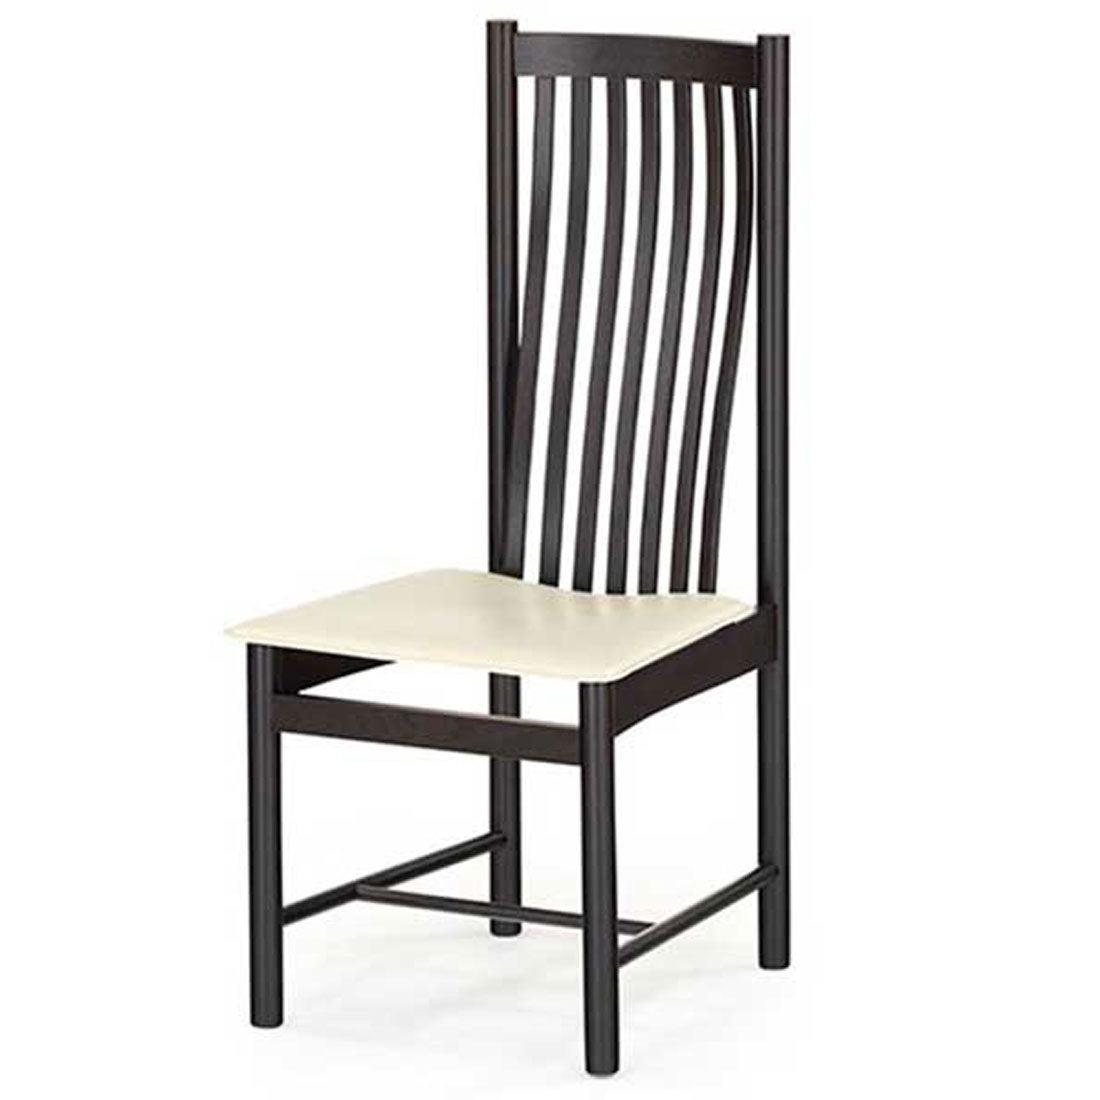 IDC OTSUKA/大塚家具 椅子 ノバ 2706 革ホワイト/WE(ウェンジ色)オーク (ホワイト)